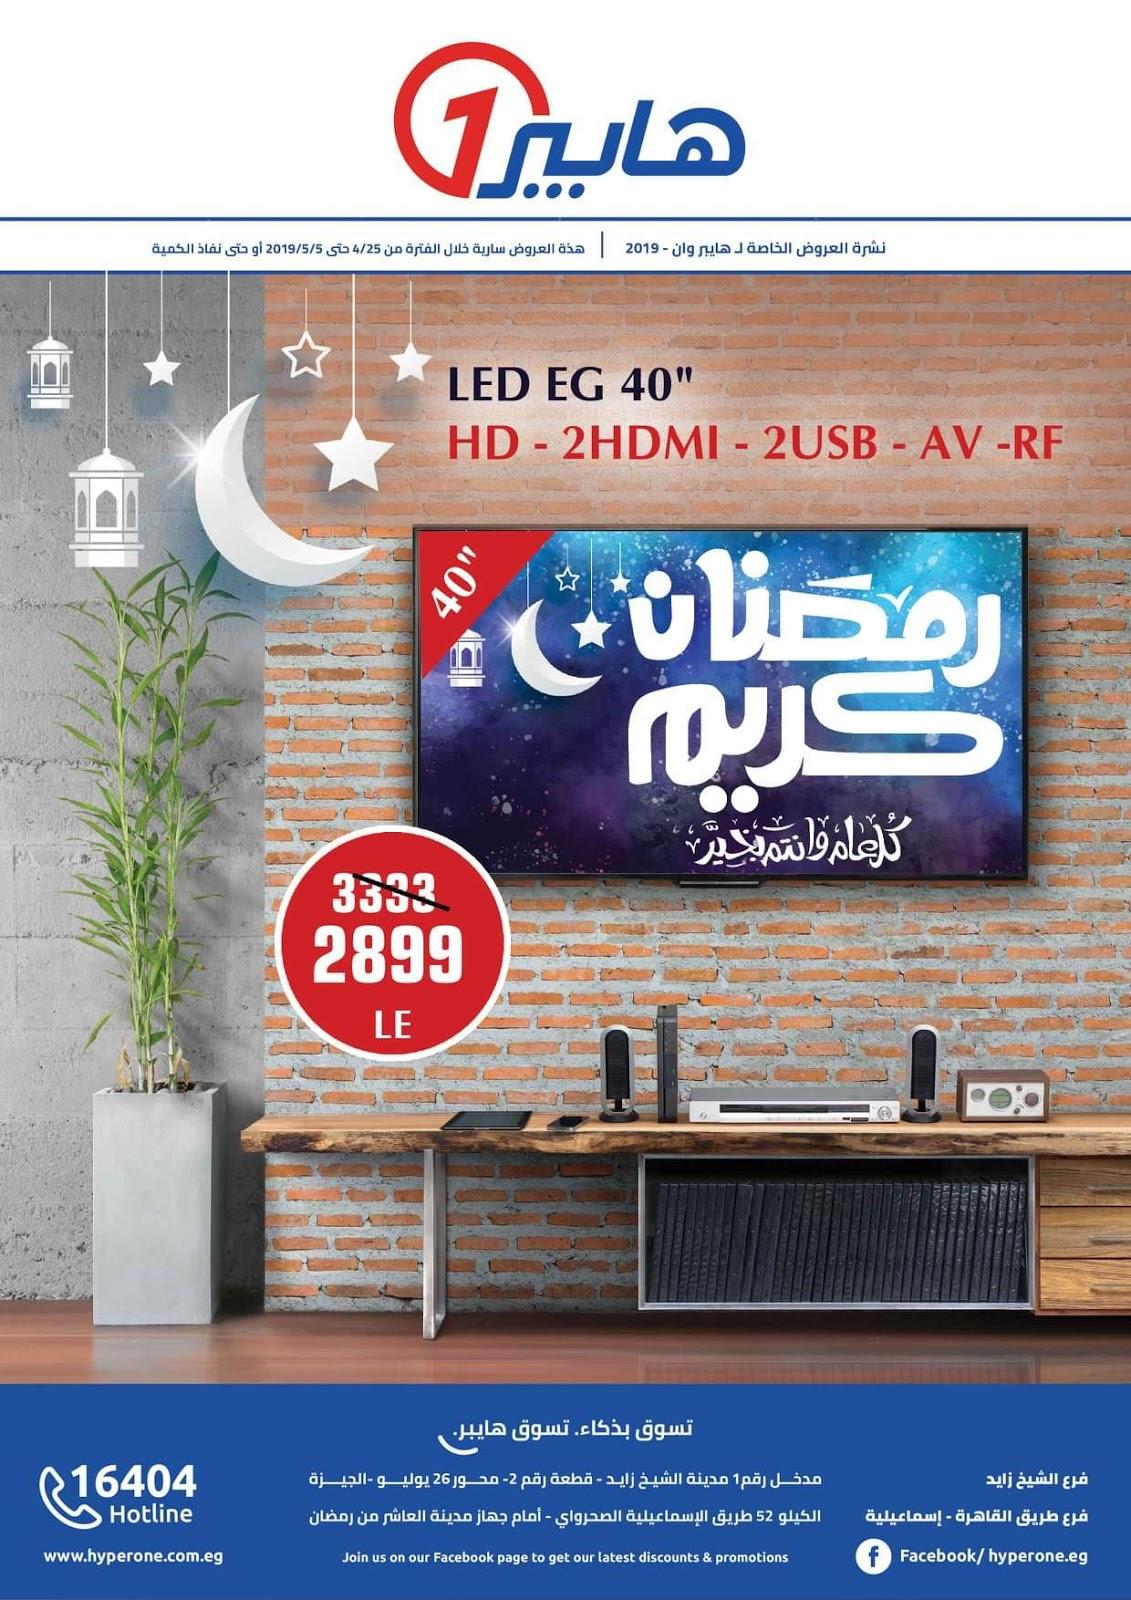 395efa470 عروض هايبر وان رمضان كريم من 25 ابريل حتى 5 مايو 2019 عروض رمضان